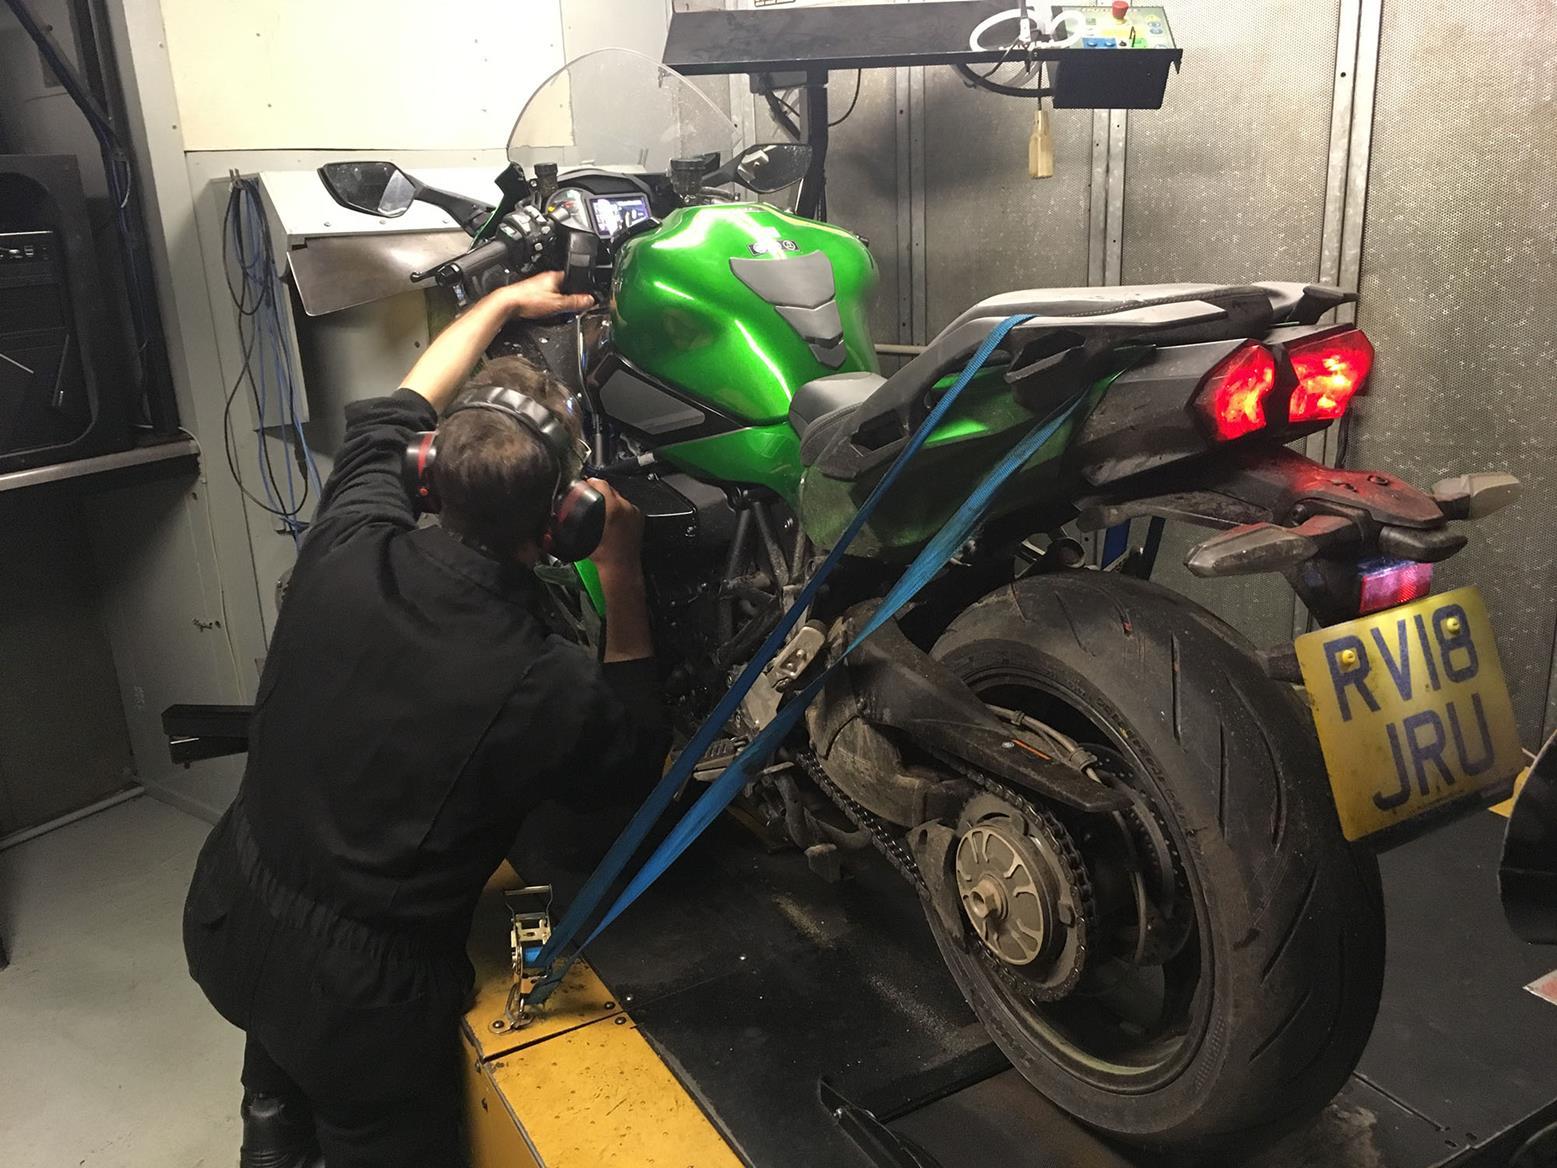 Kawasaki Ninja H2 Sx Vs Zzr1400 On The Dyno Mcn Z1000 Lighting System Circuit